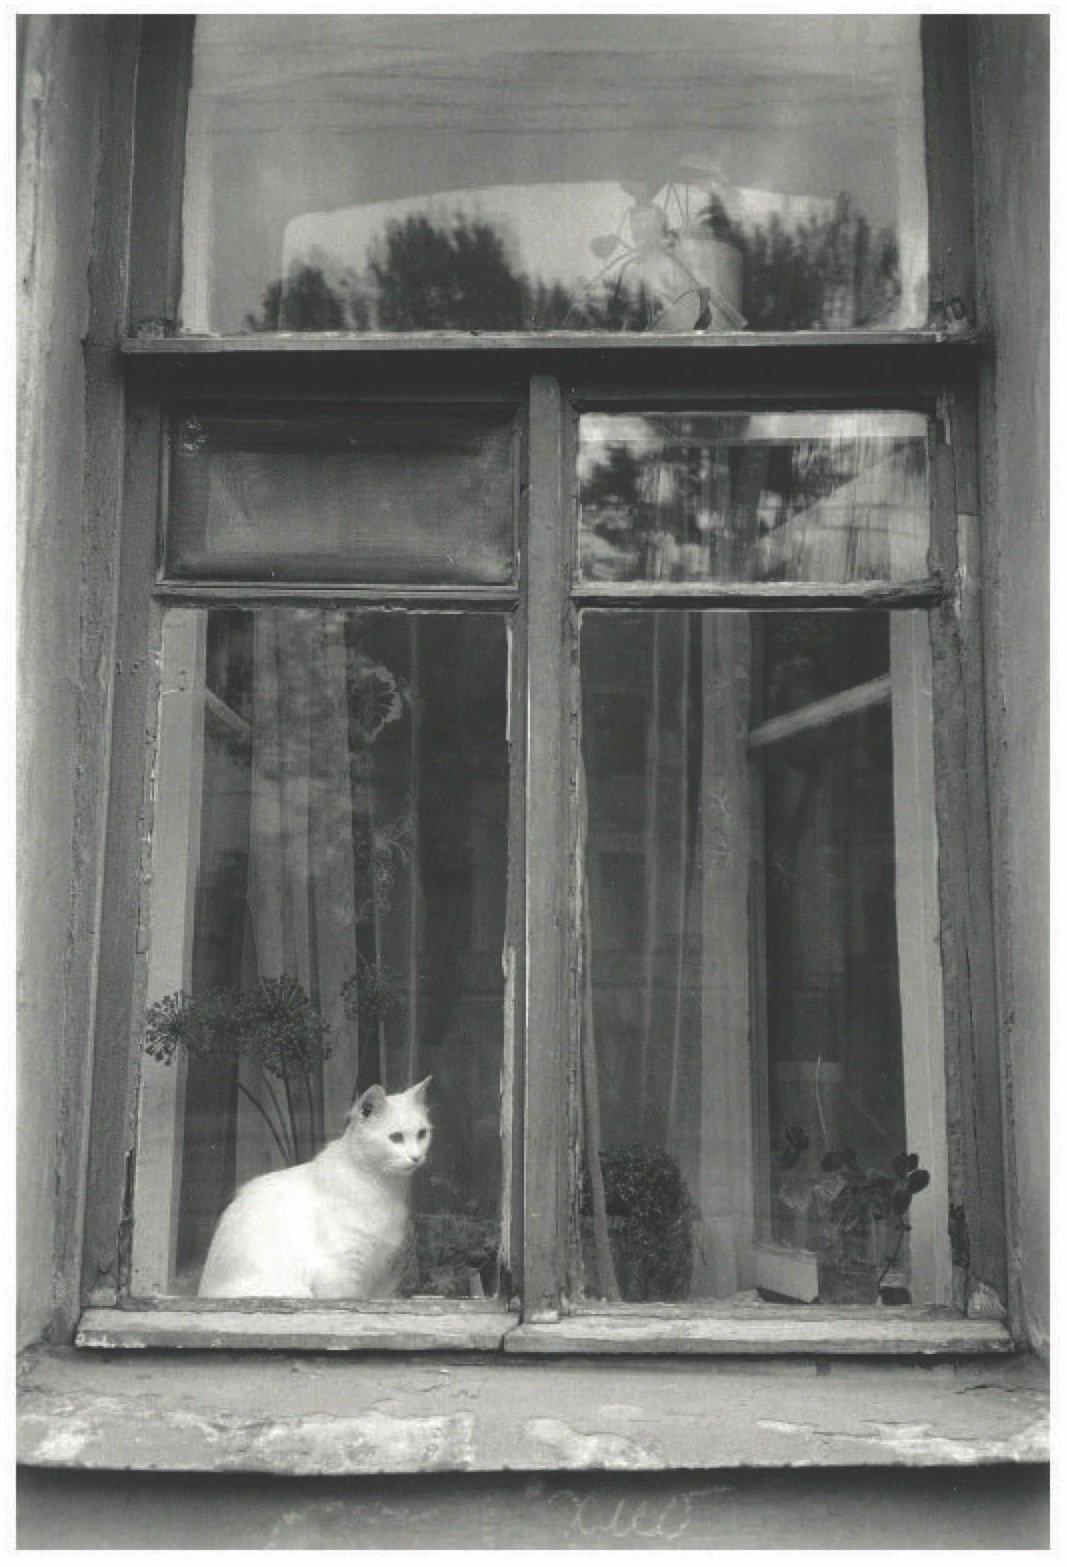 Cat in Window, Russia 1992